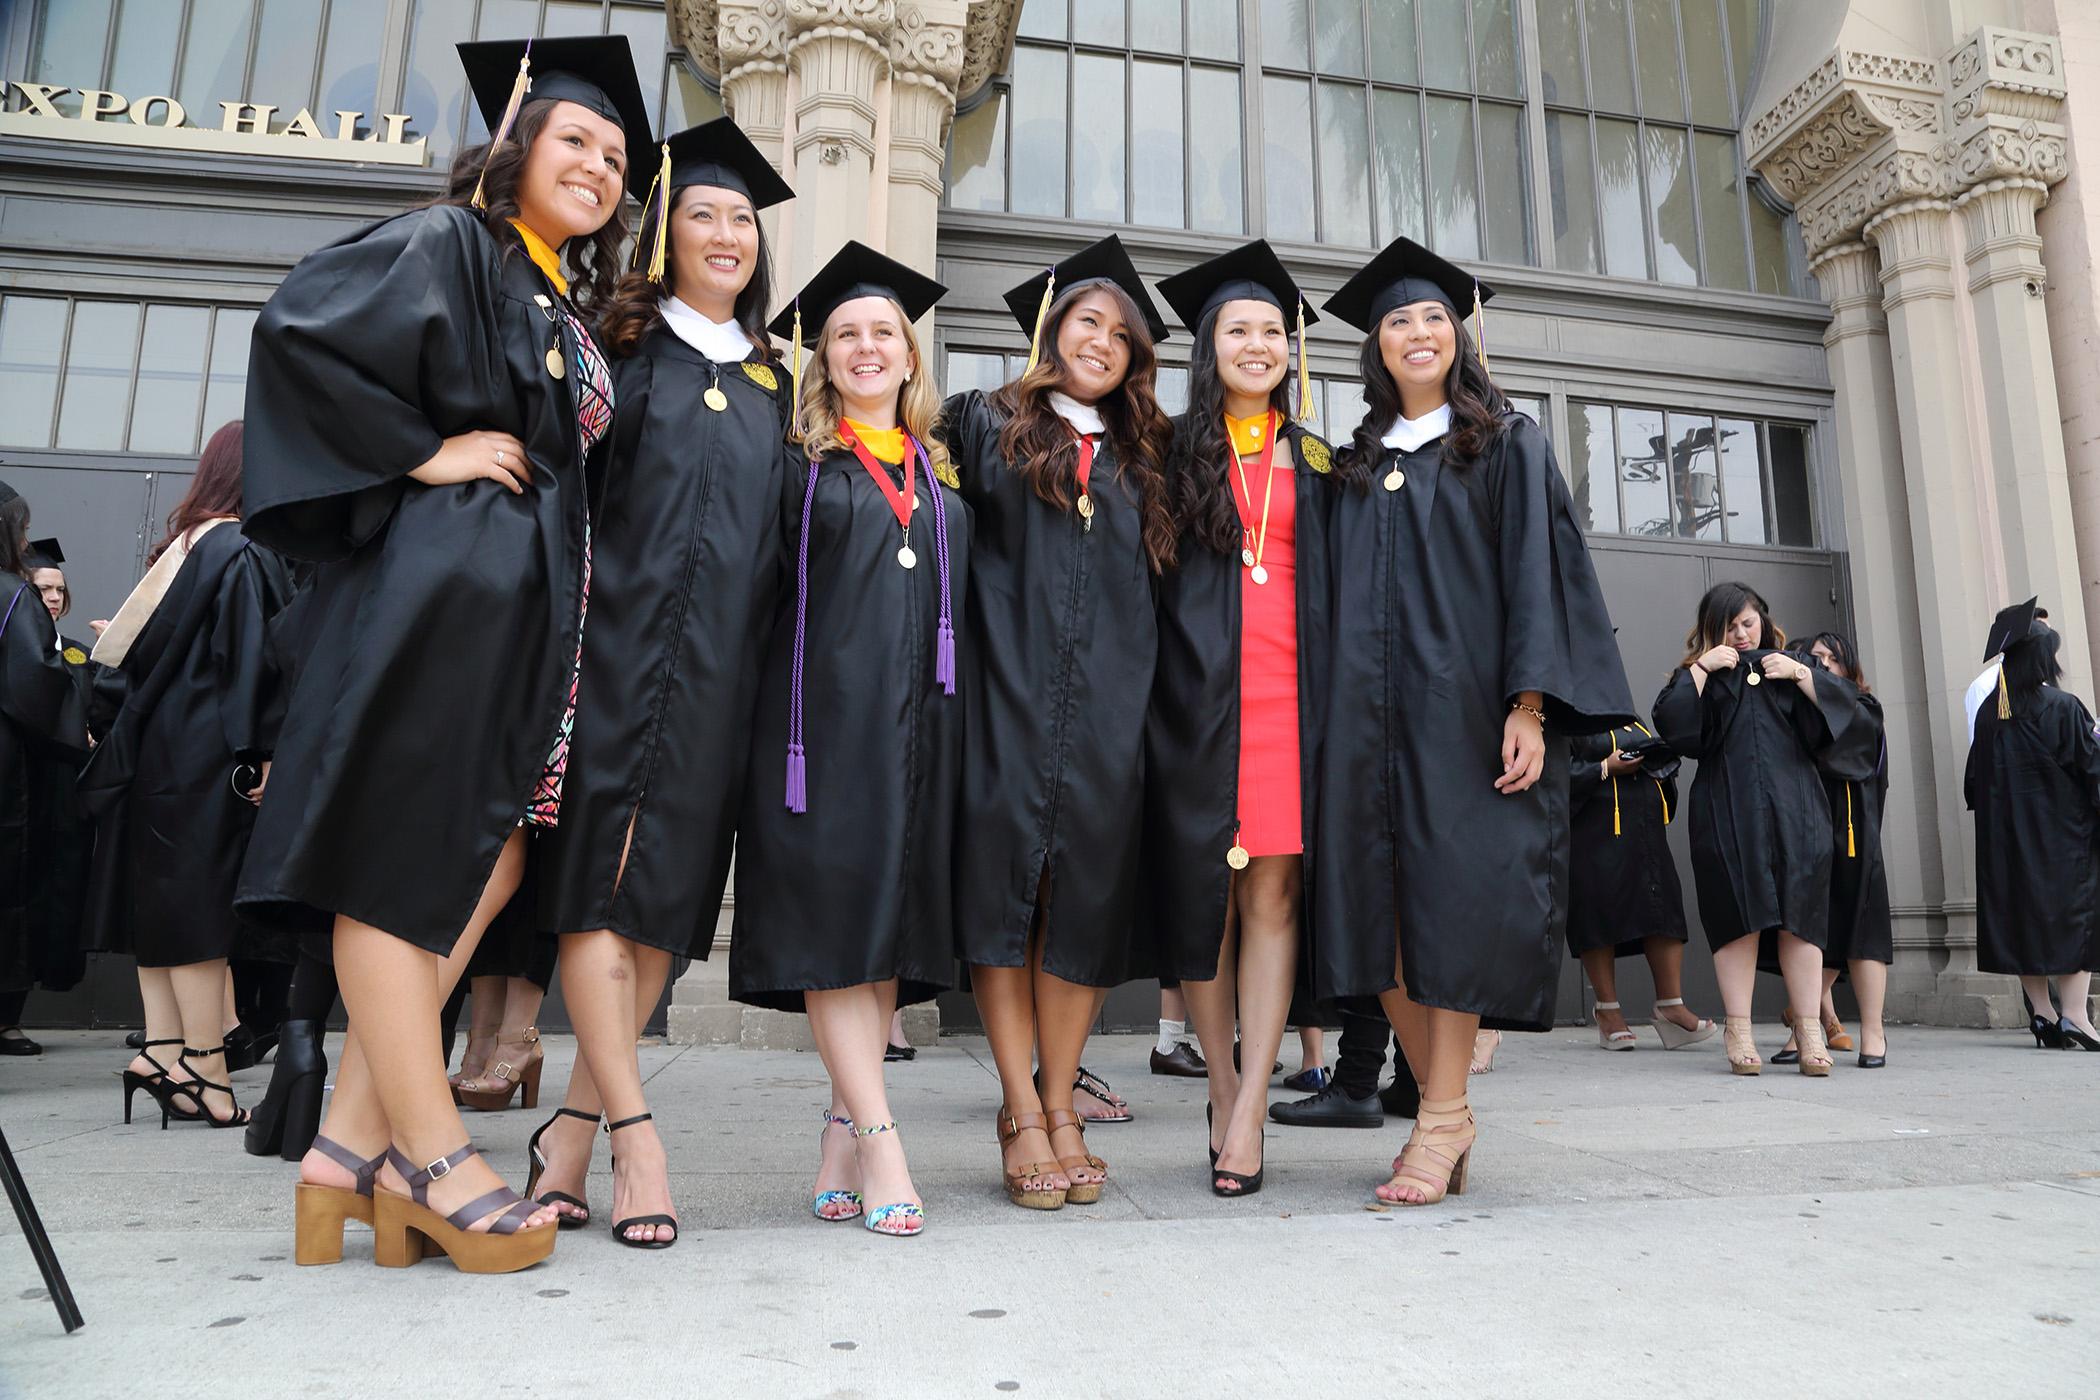 Graduates of Mount Saint Mary's College